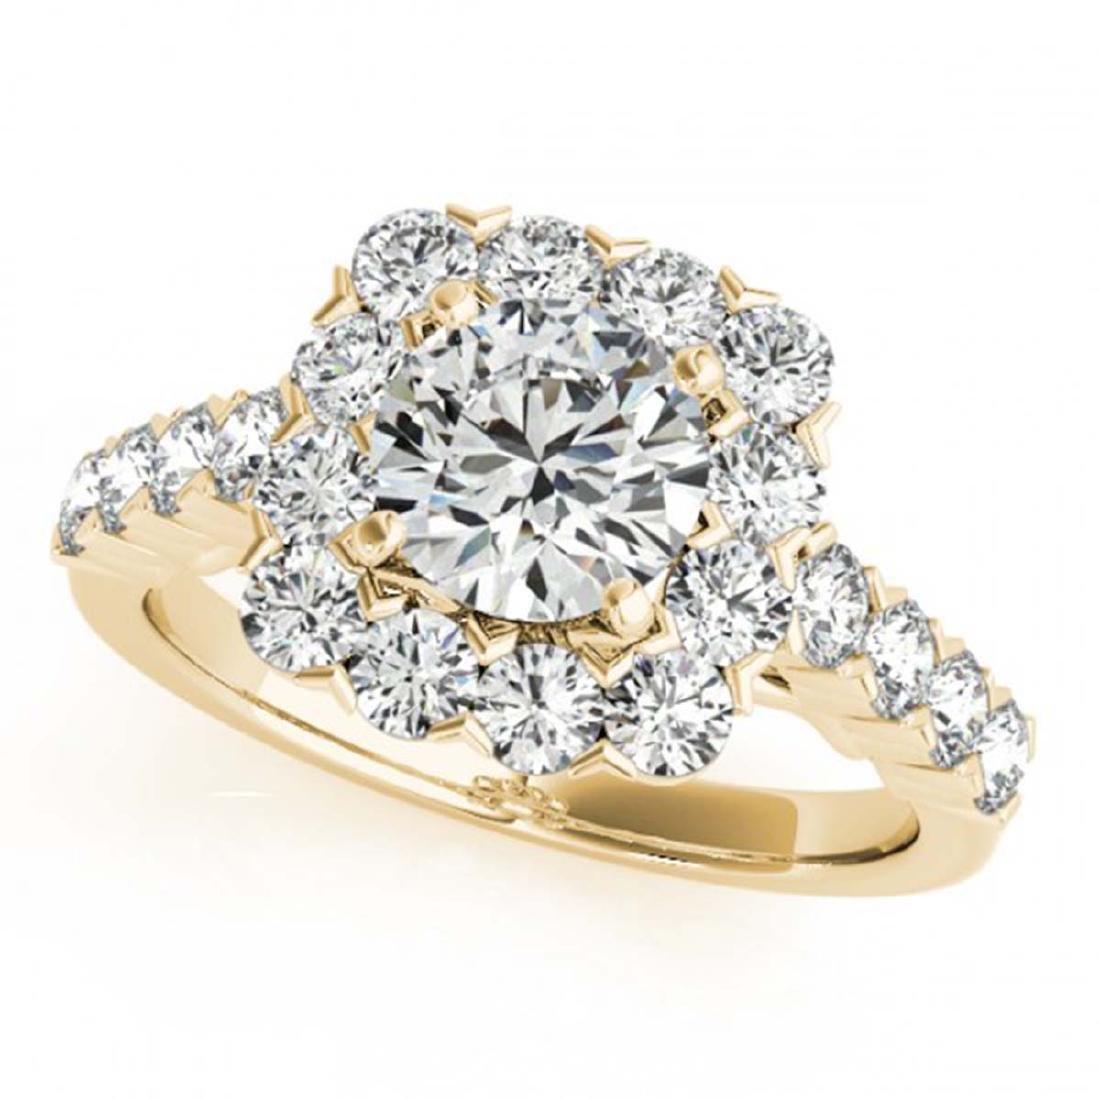 2.5 ctw VS/SI Diamond Halo Ring 18K Yellow Gold -